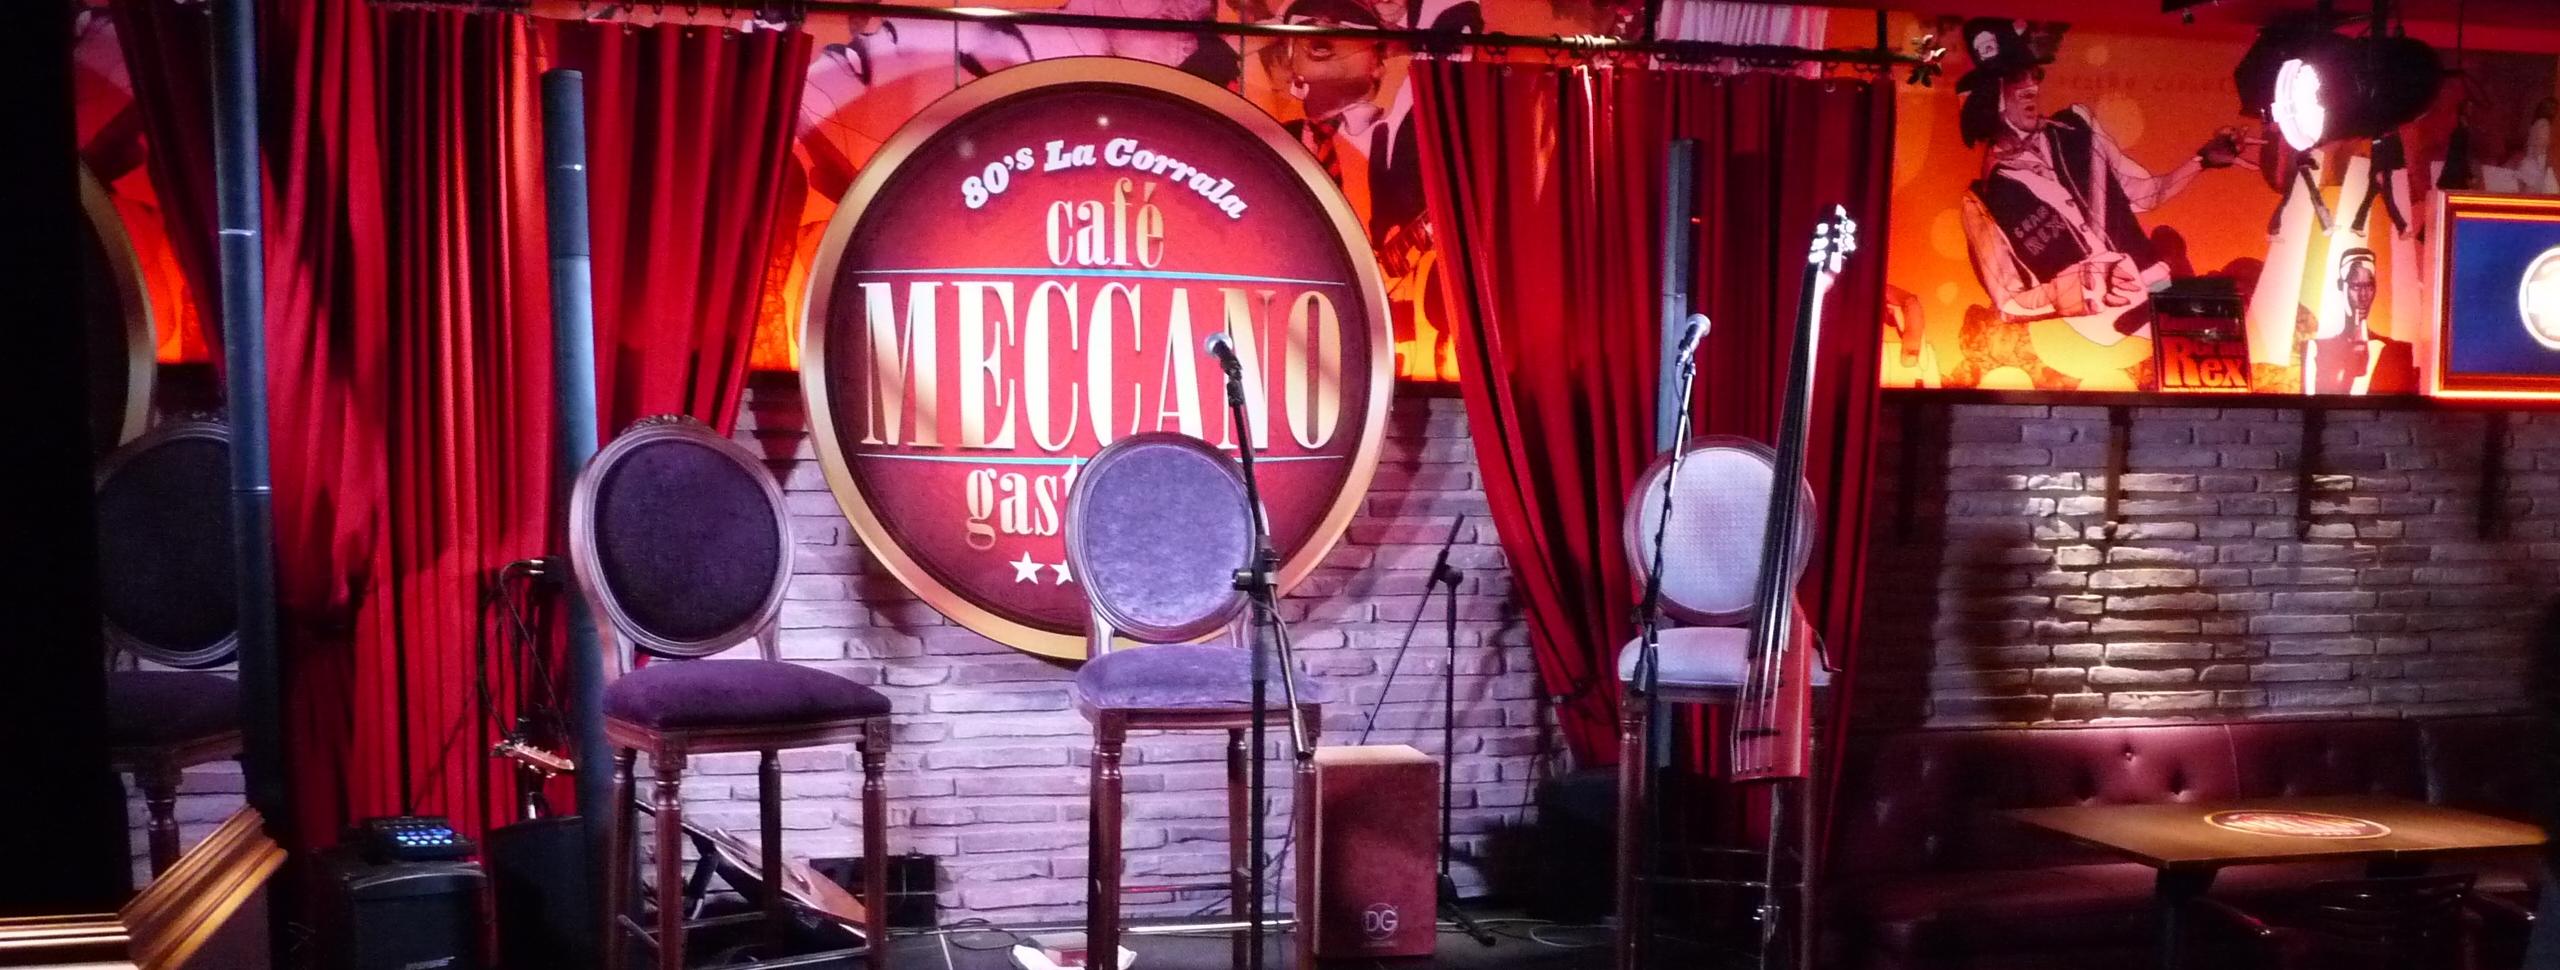 Cafe Meccano